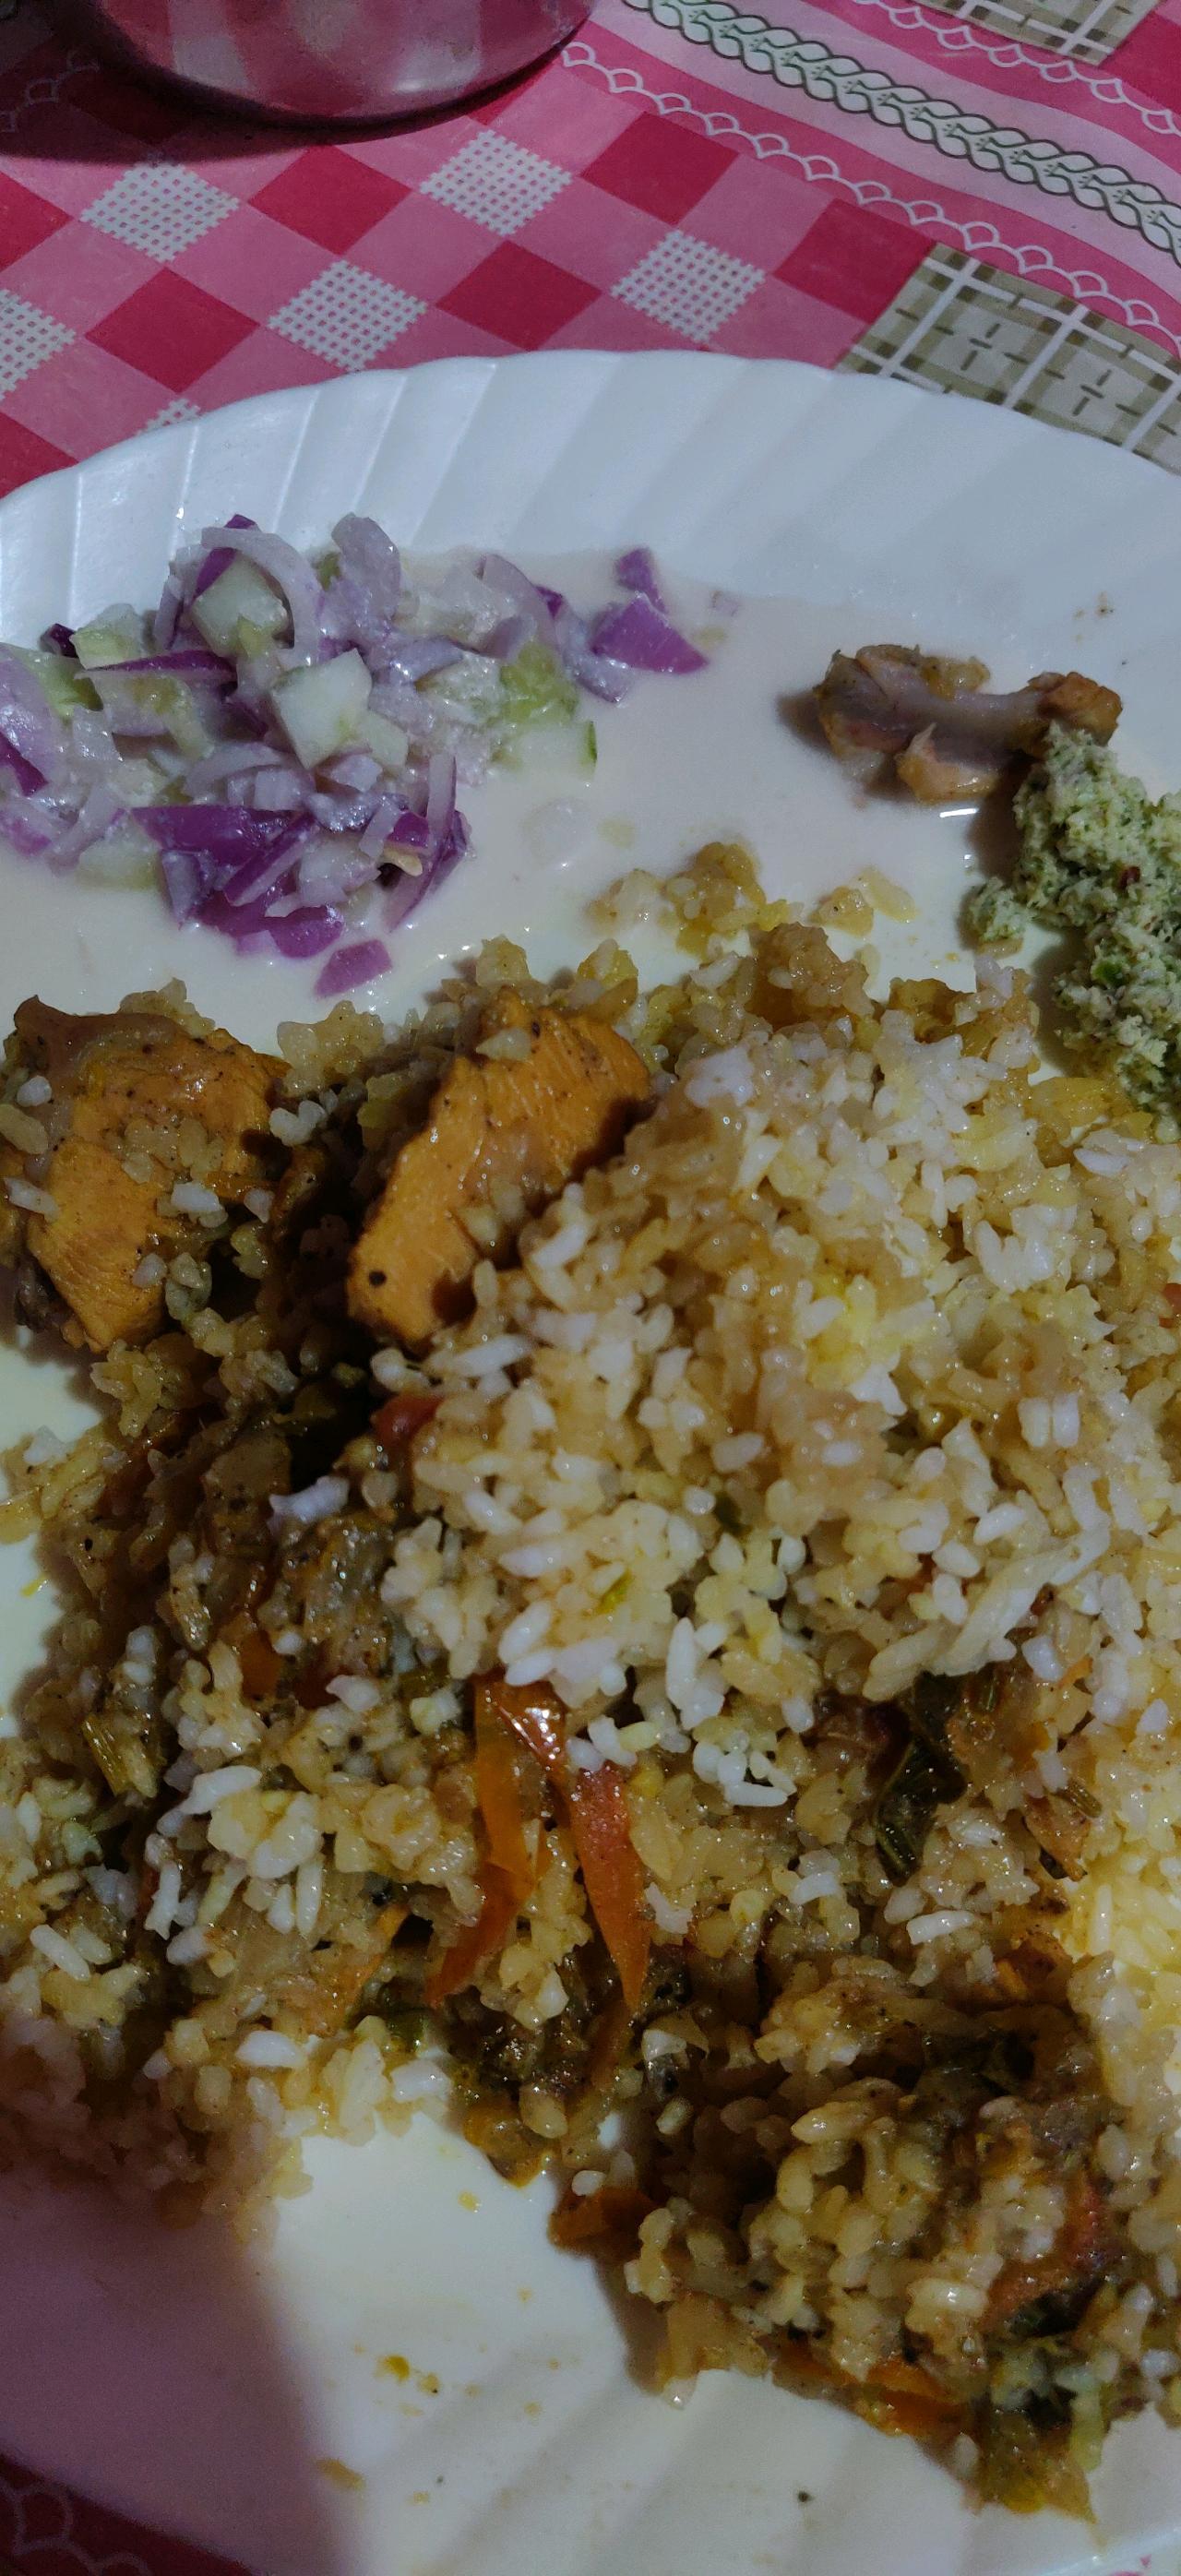 #malabar biriyani #mom's special